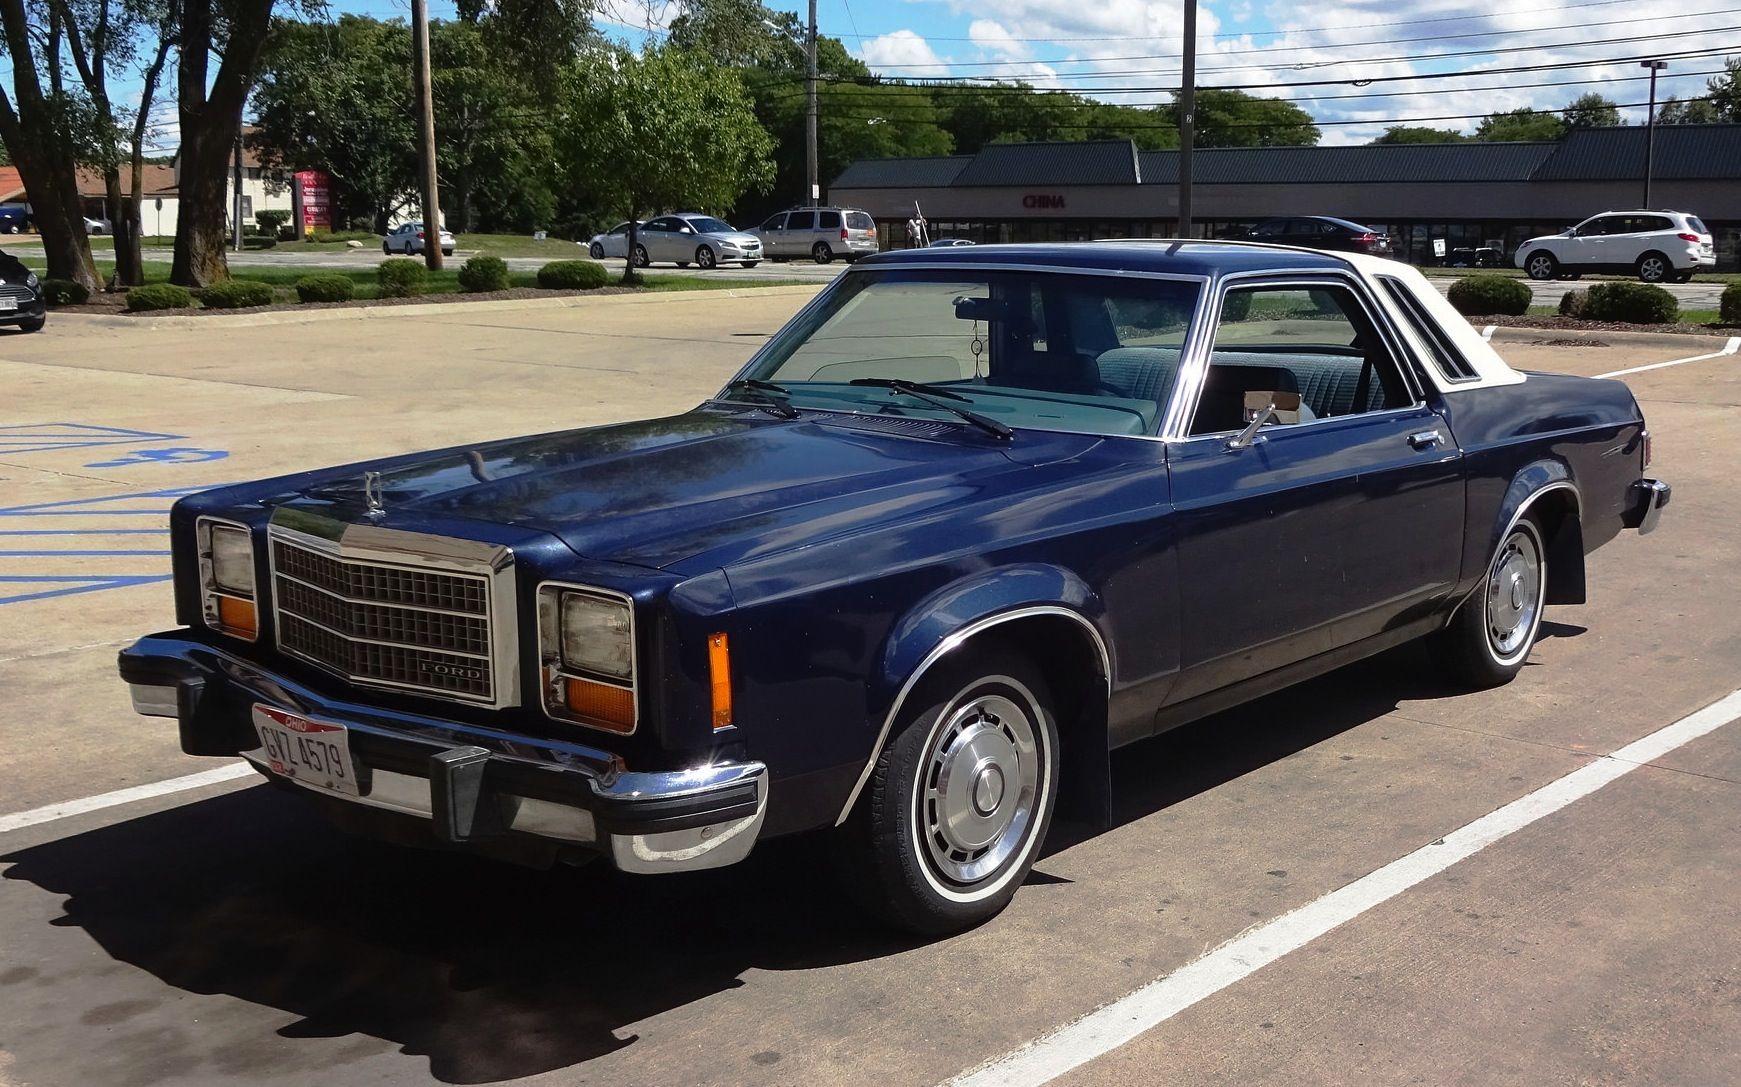 1980 Ford Granada Us 2 Door Coupe Above And 4 Door Sedan Came